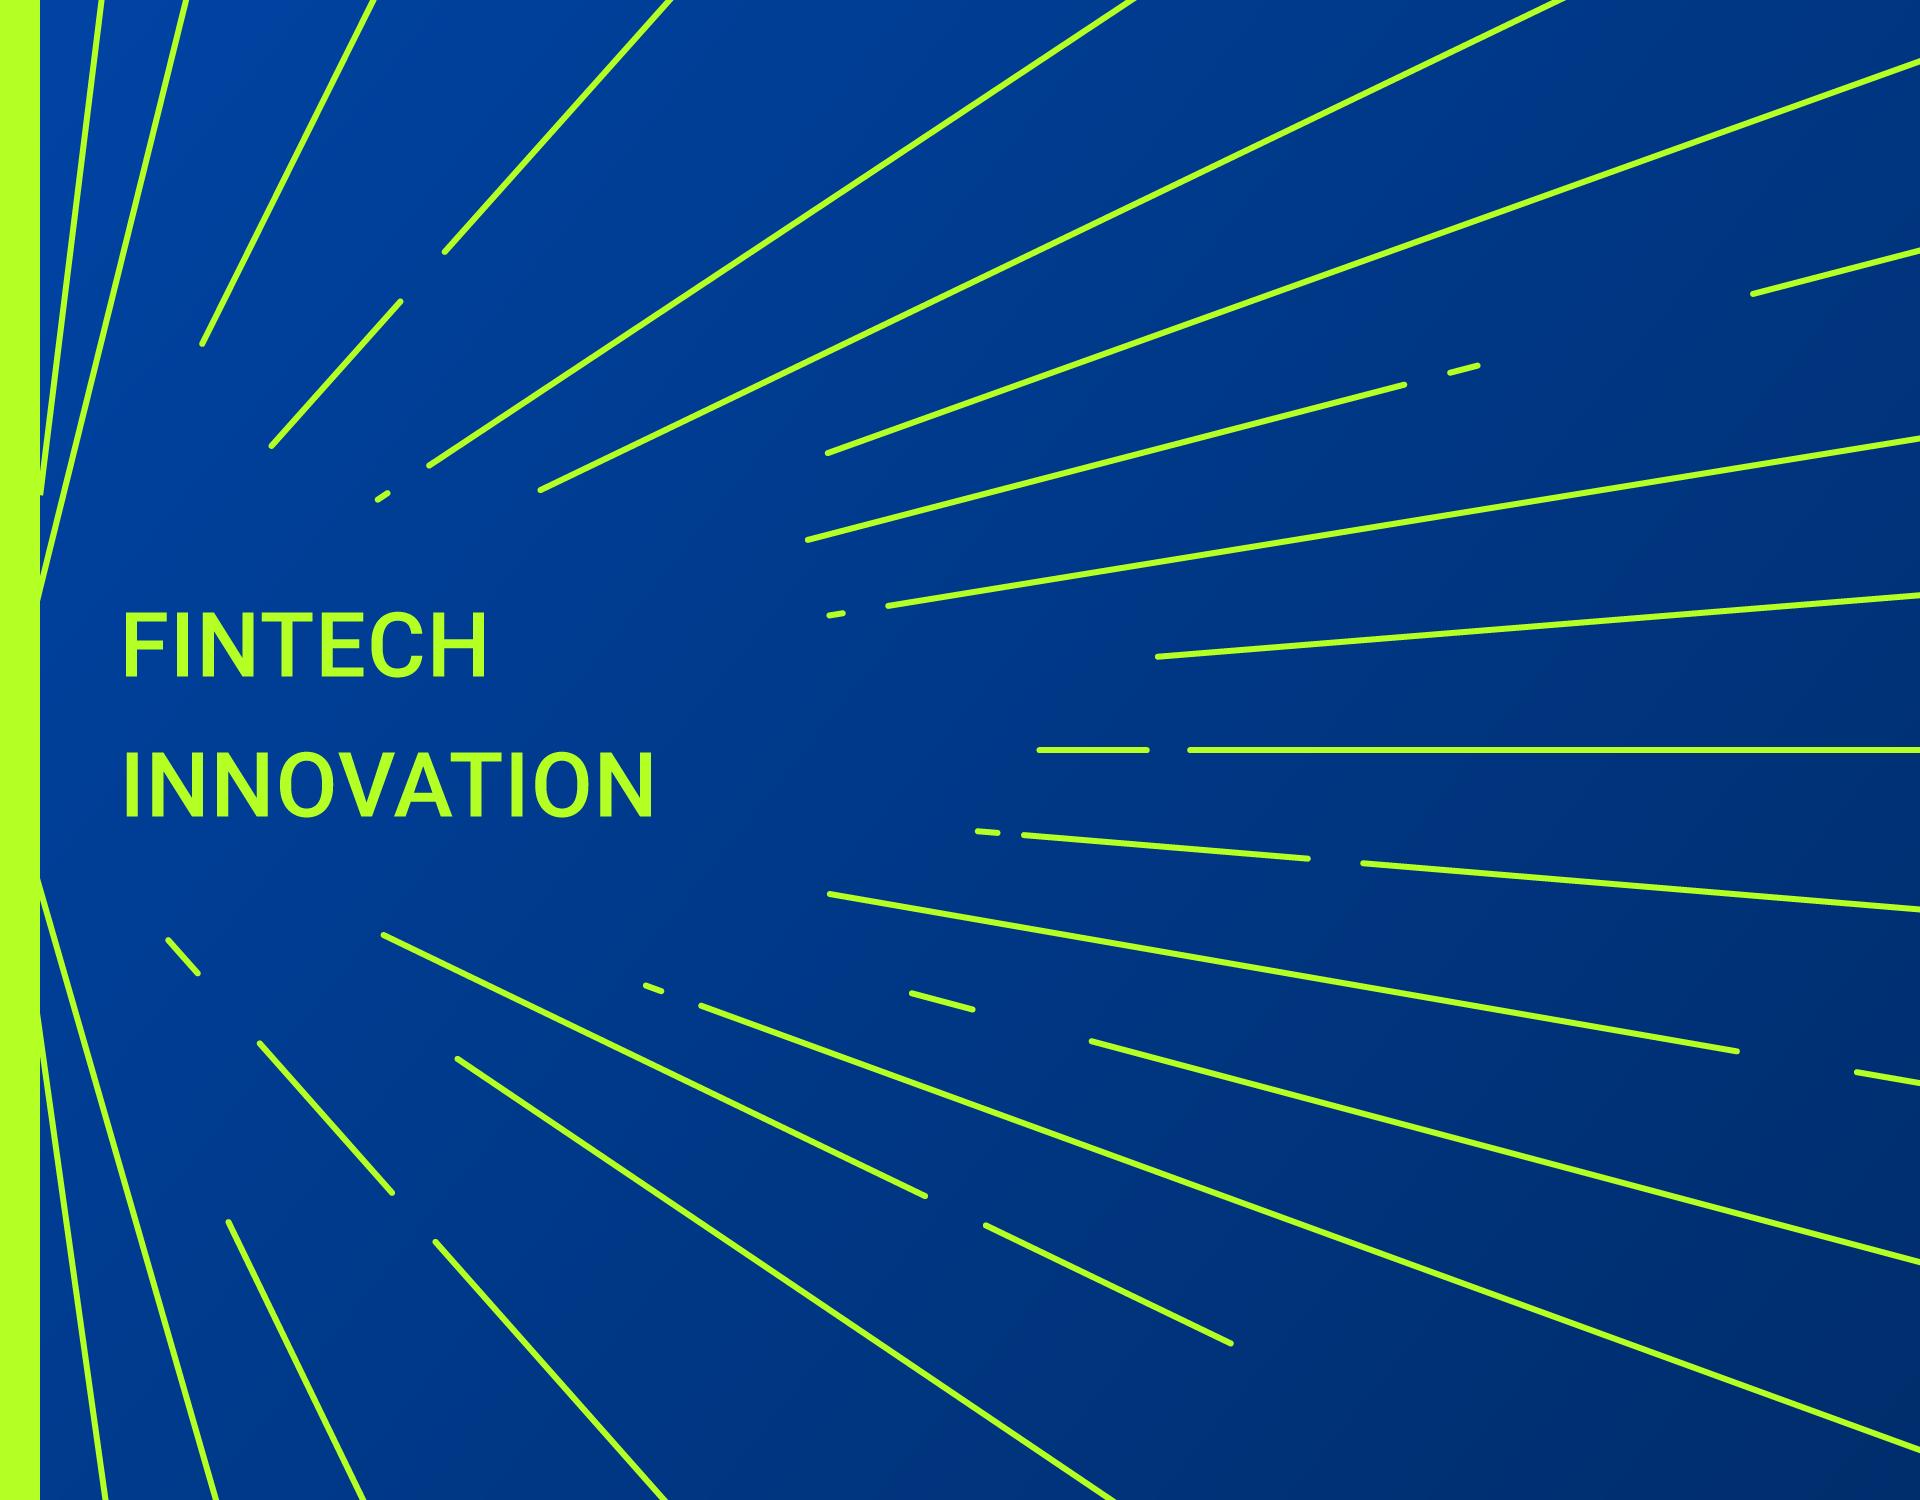 Rapporto Fintech Innovation 2020 - Open Banking: analisi dei servizi offerti in logica Open Banking.